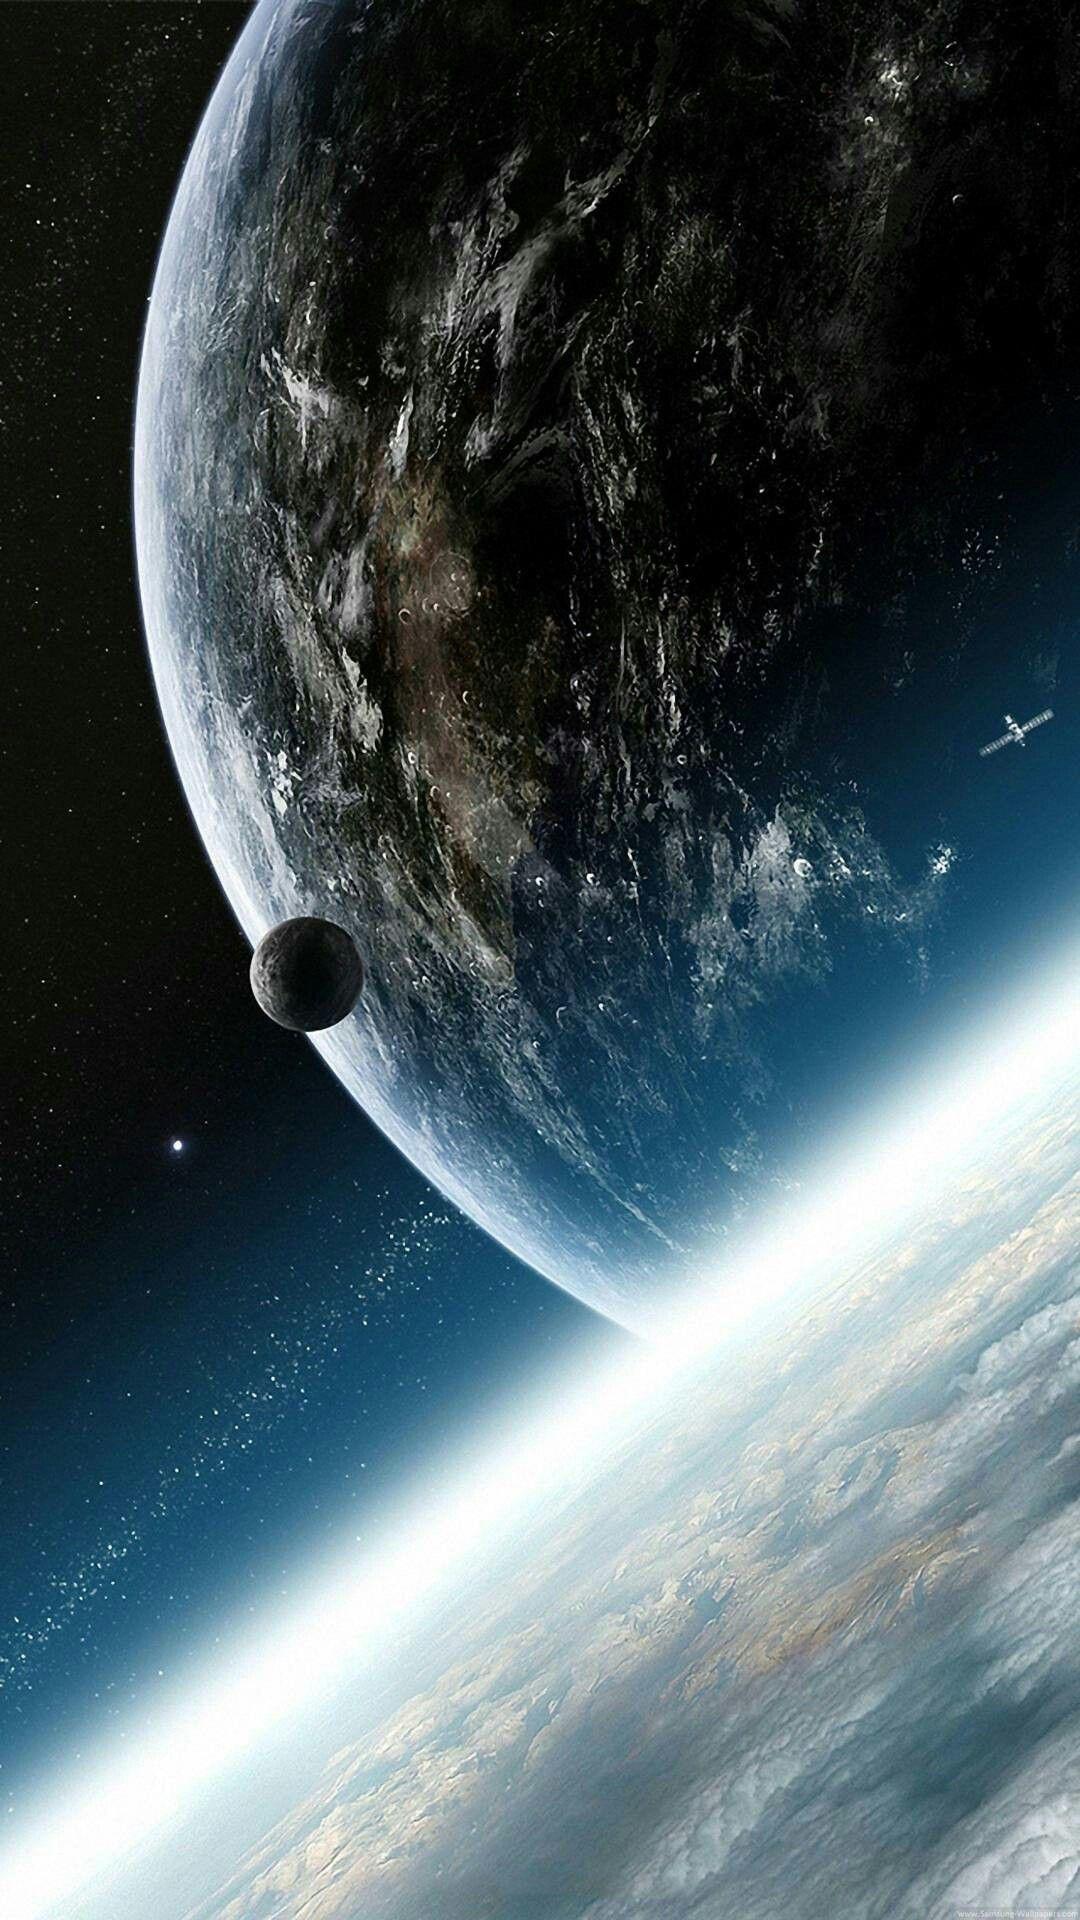 Wallpaper Para Celular Empapelado De Galaxias Fondos De Pantalla Universo Fondos De Universo